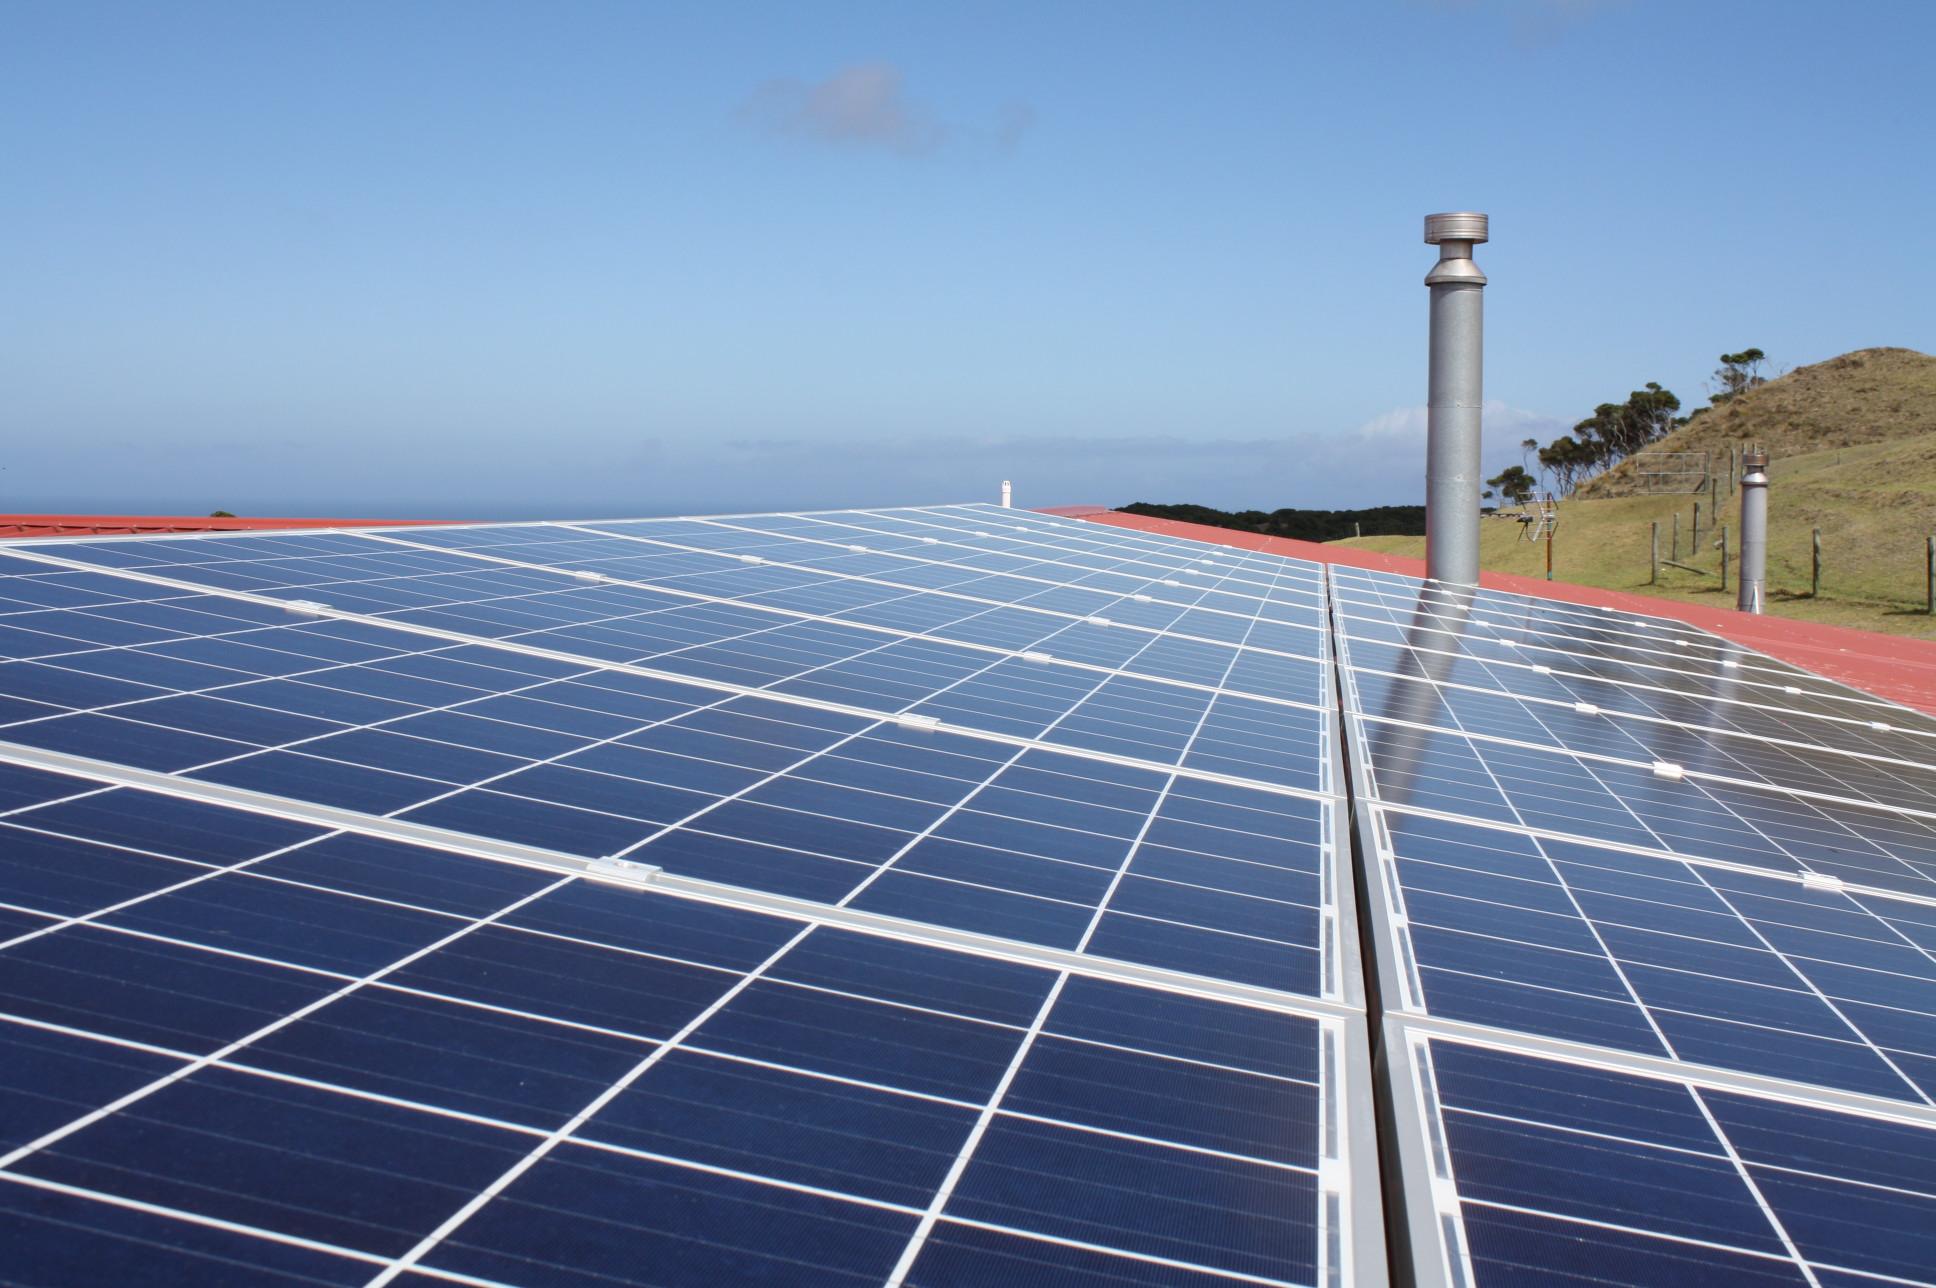 Solar Electricity Systems|Kiwi Solar ltd